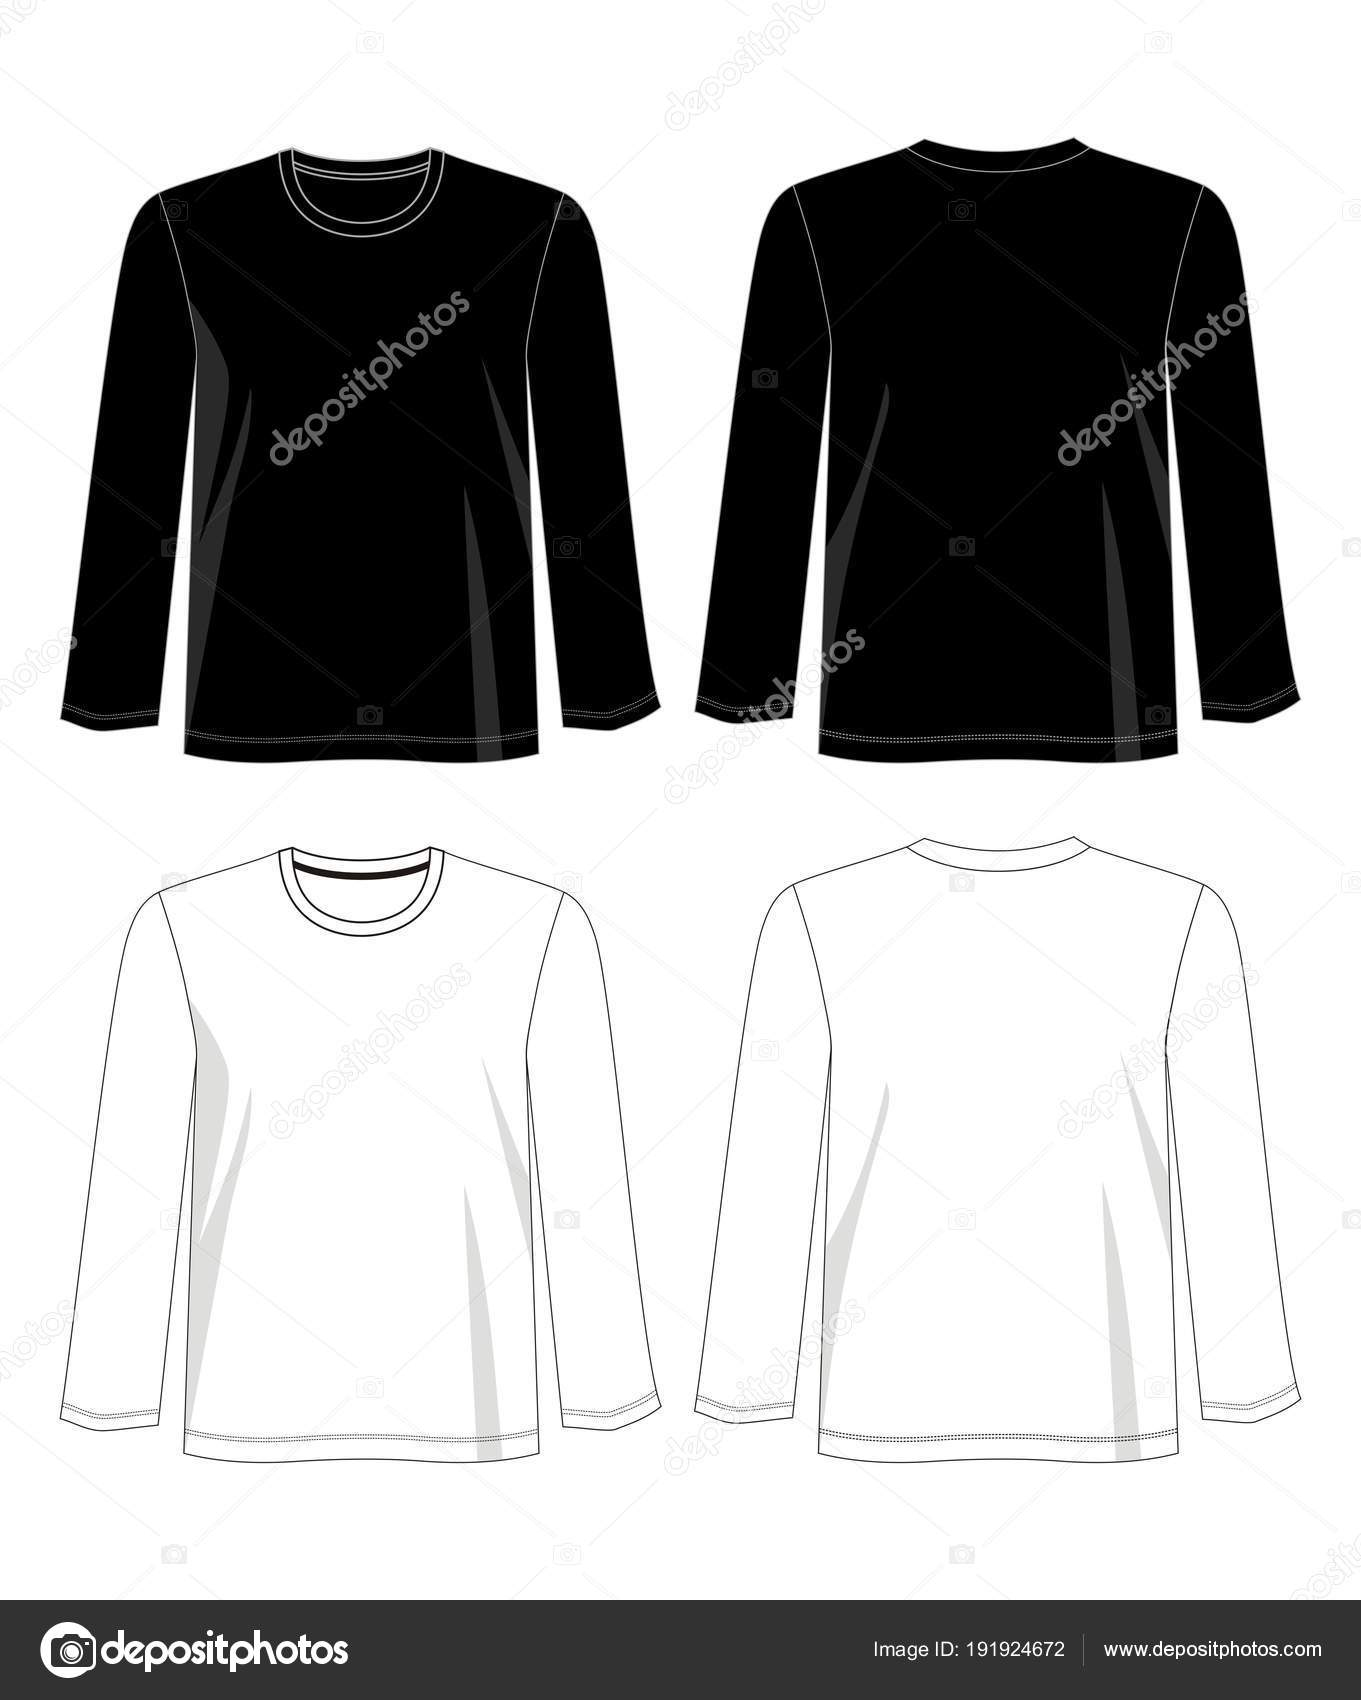 Long Sleeve Shirt Vector : sleeve, shirt, vector, Vector, Design, Shirt, Template, Color, Black, White, Image, D2ptri, Stock, 191924672